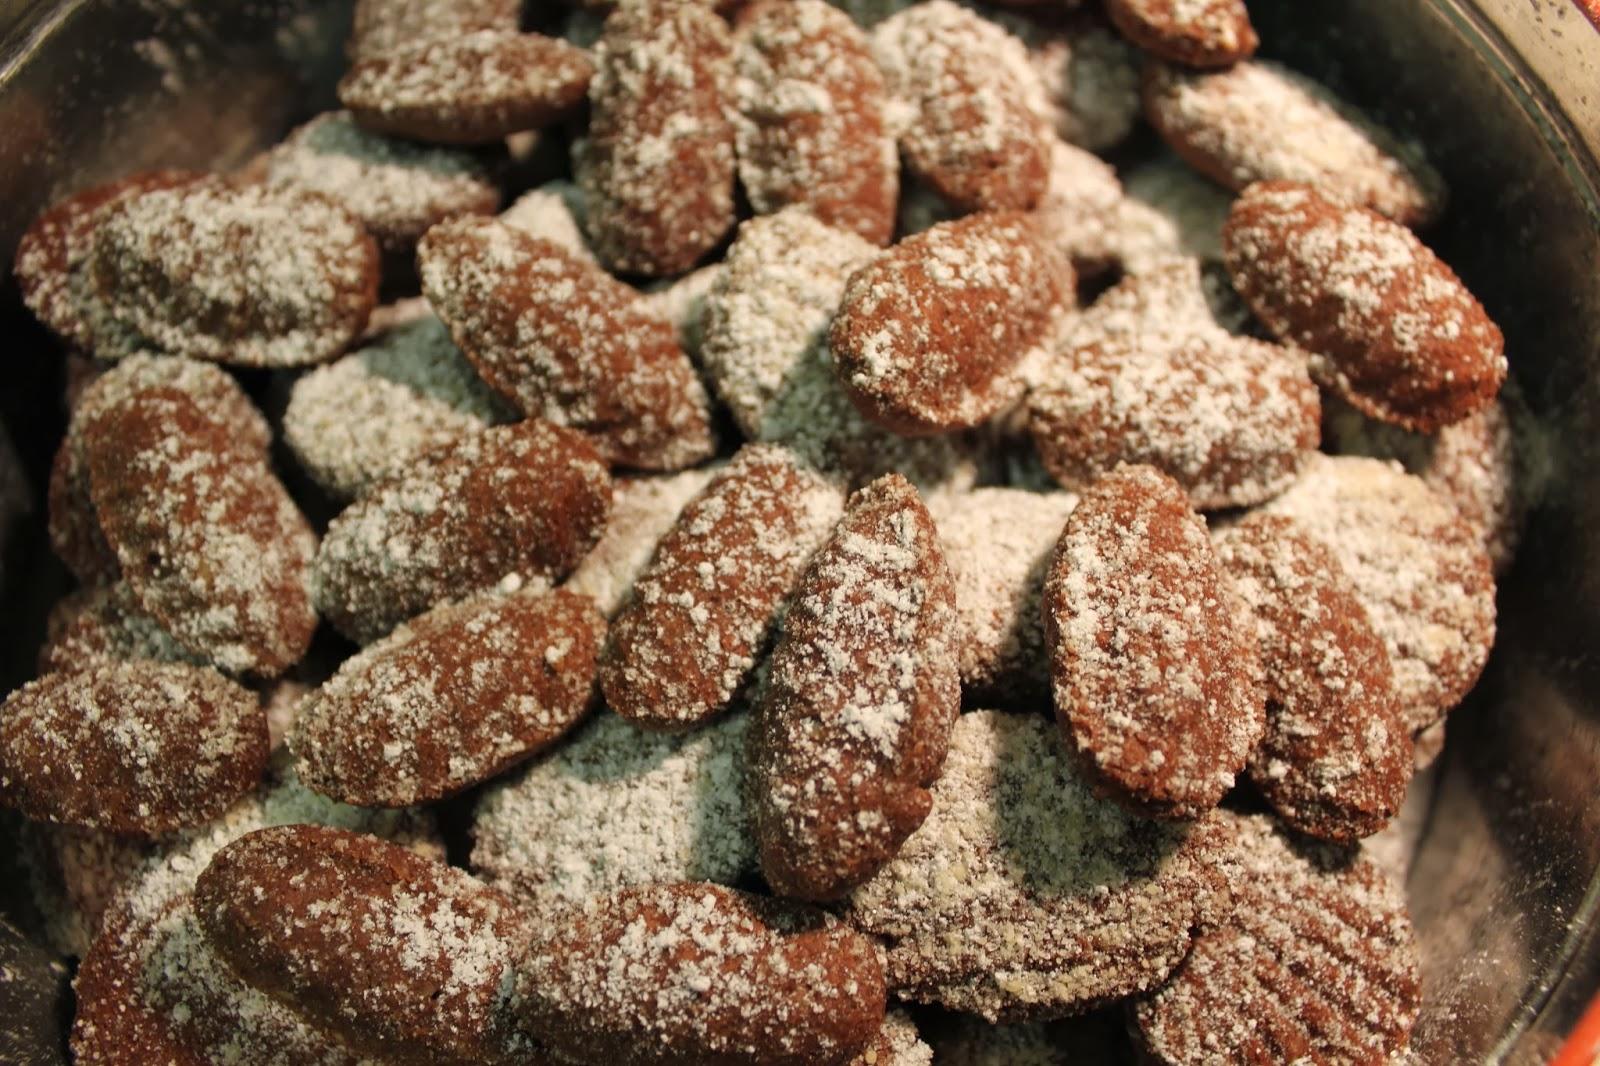 My Grandmother's Christmas Cookies: Medvědí Tlapky (Bear's